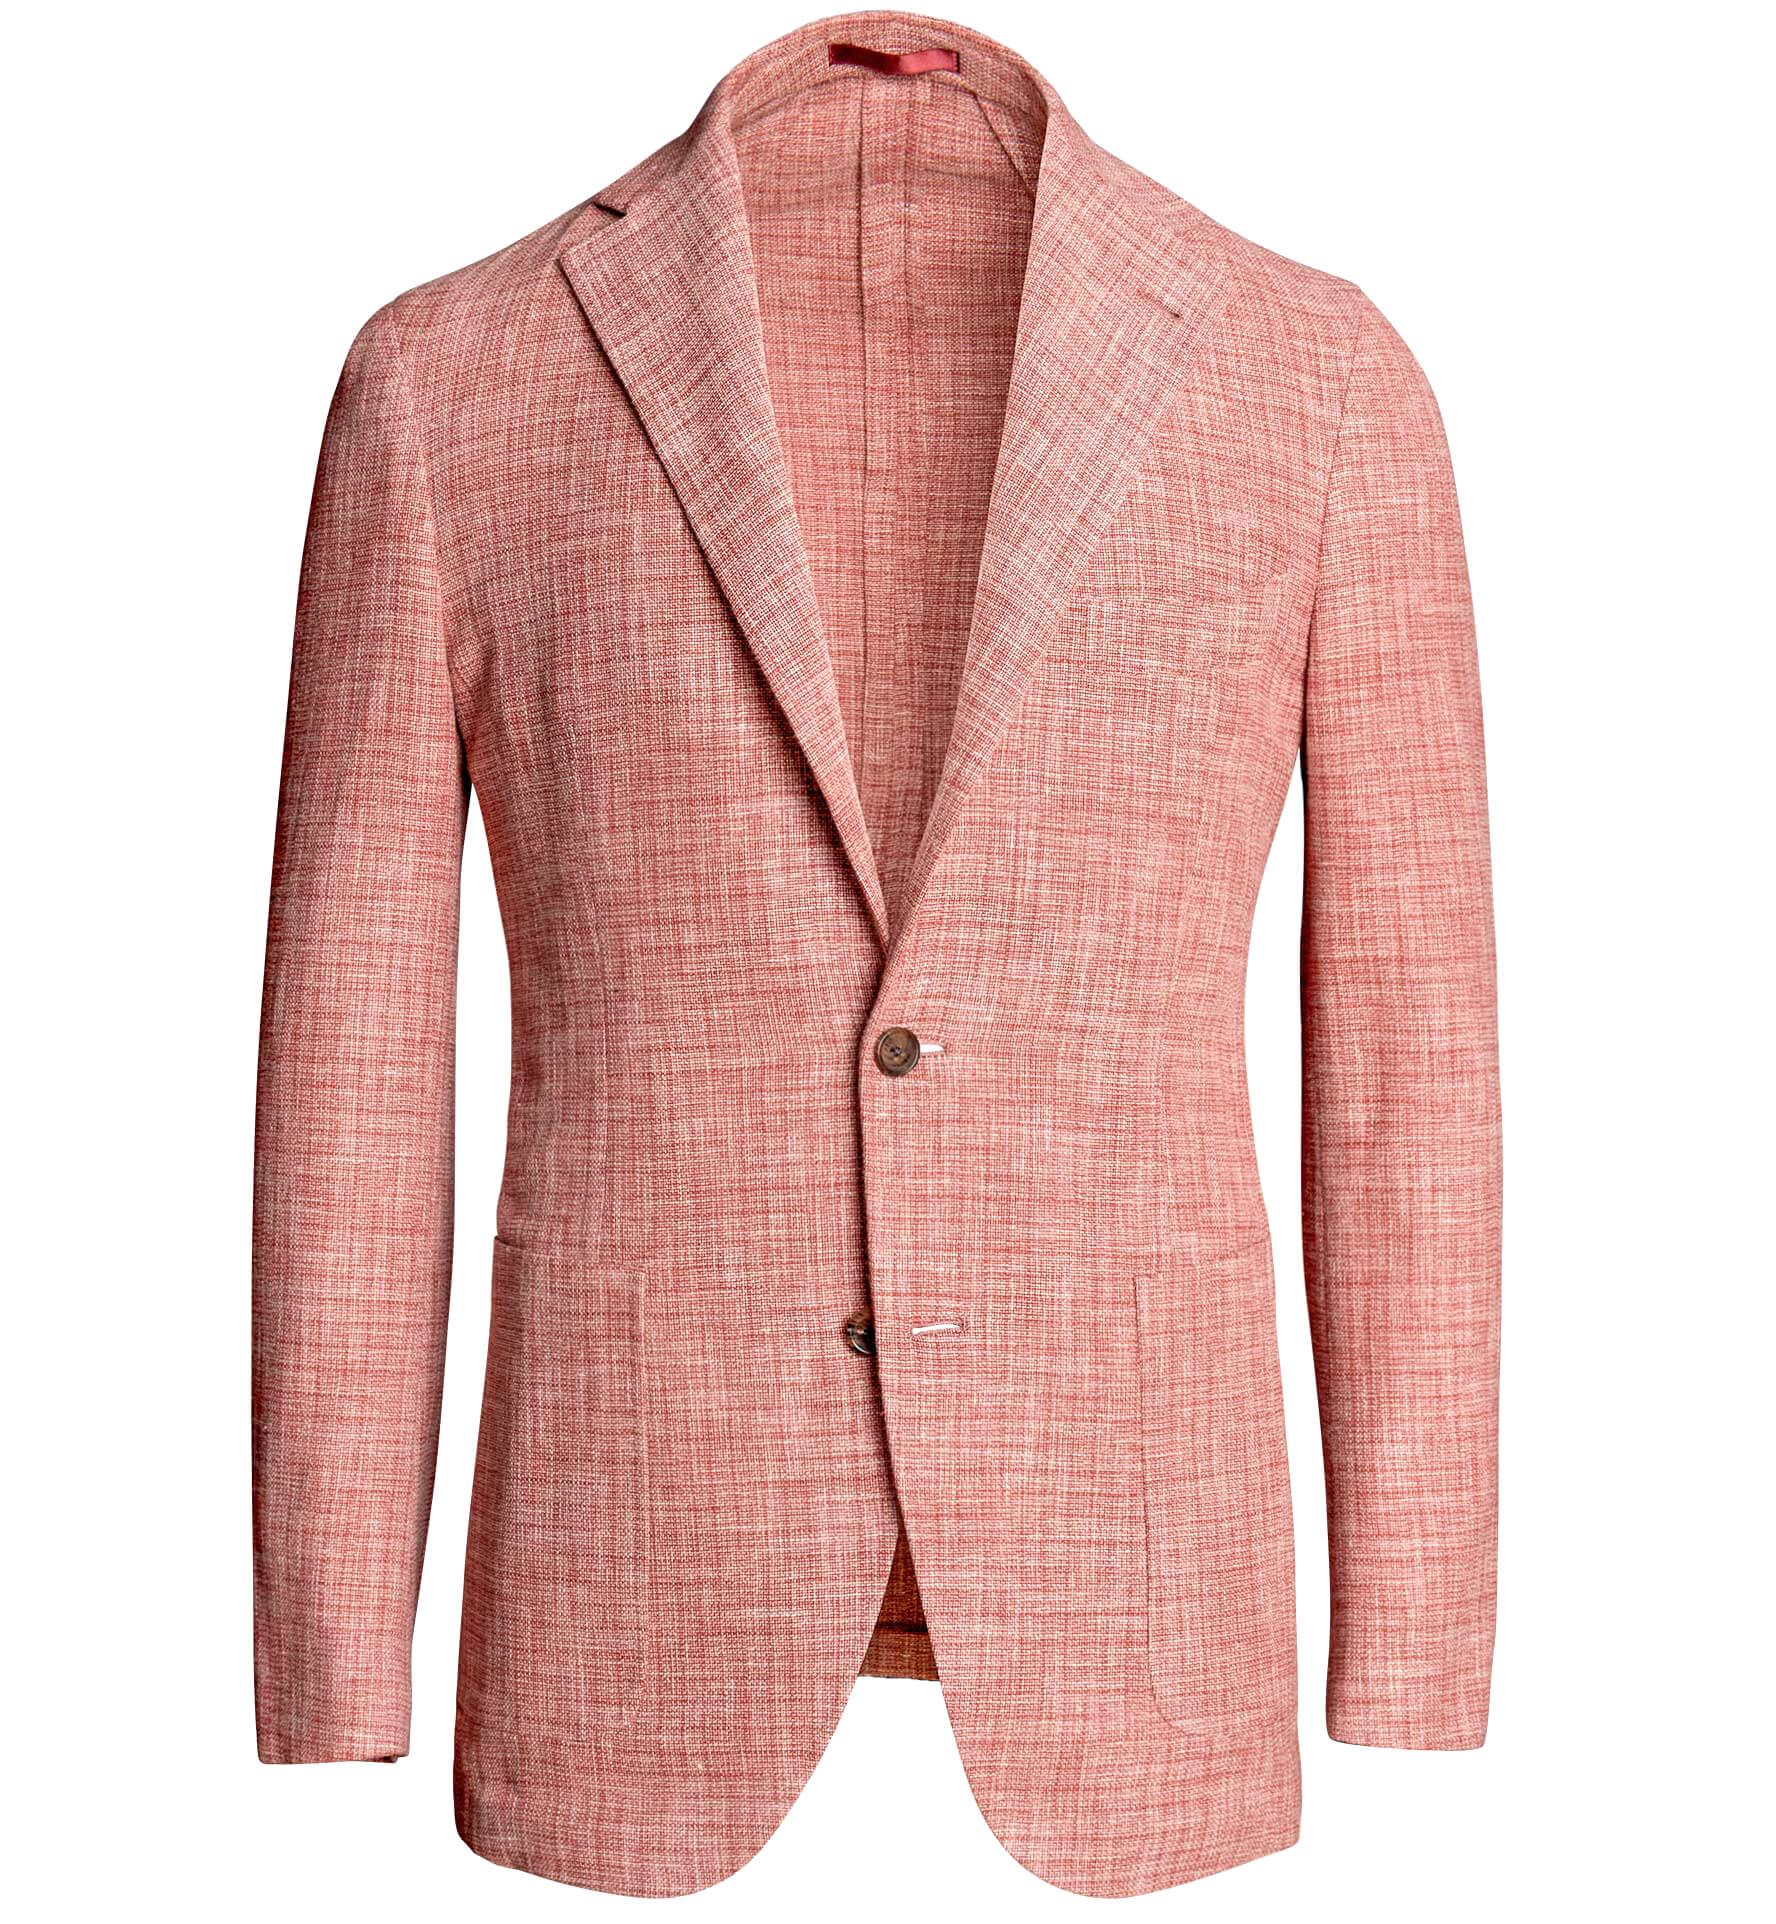 Zoom Image of Waverly Coral Wool Blend Gauze Weave Jacket